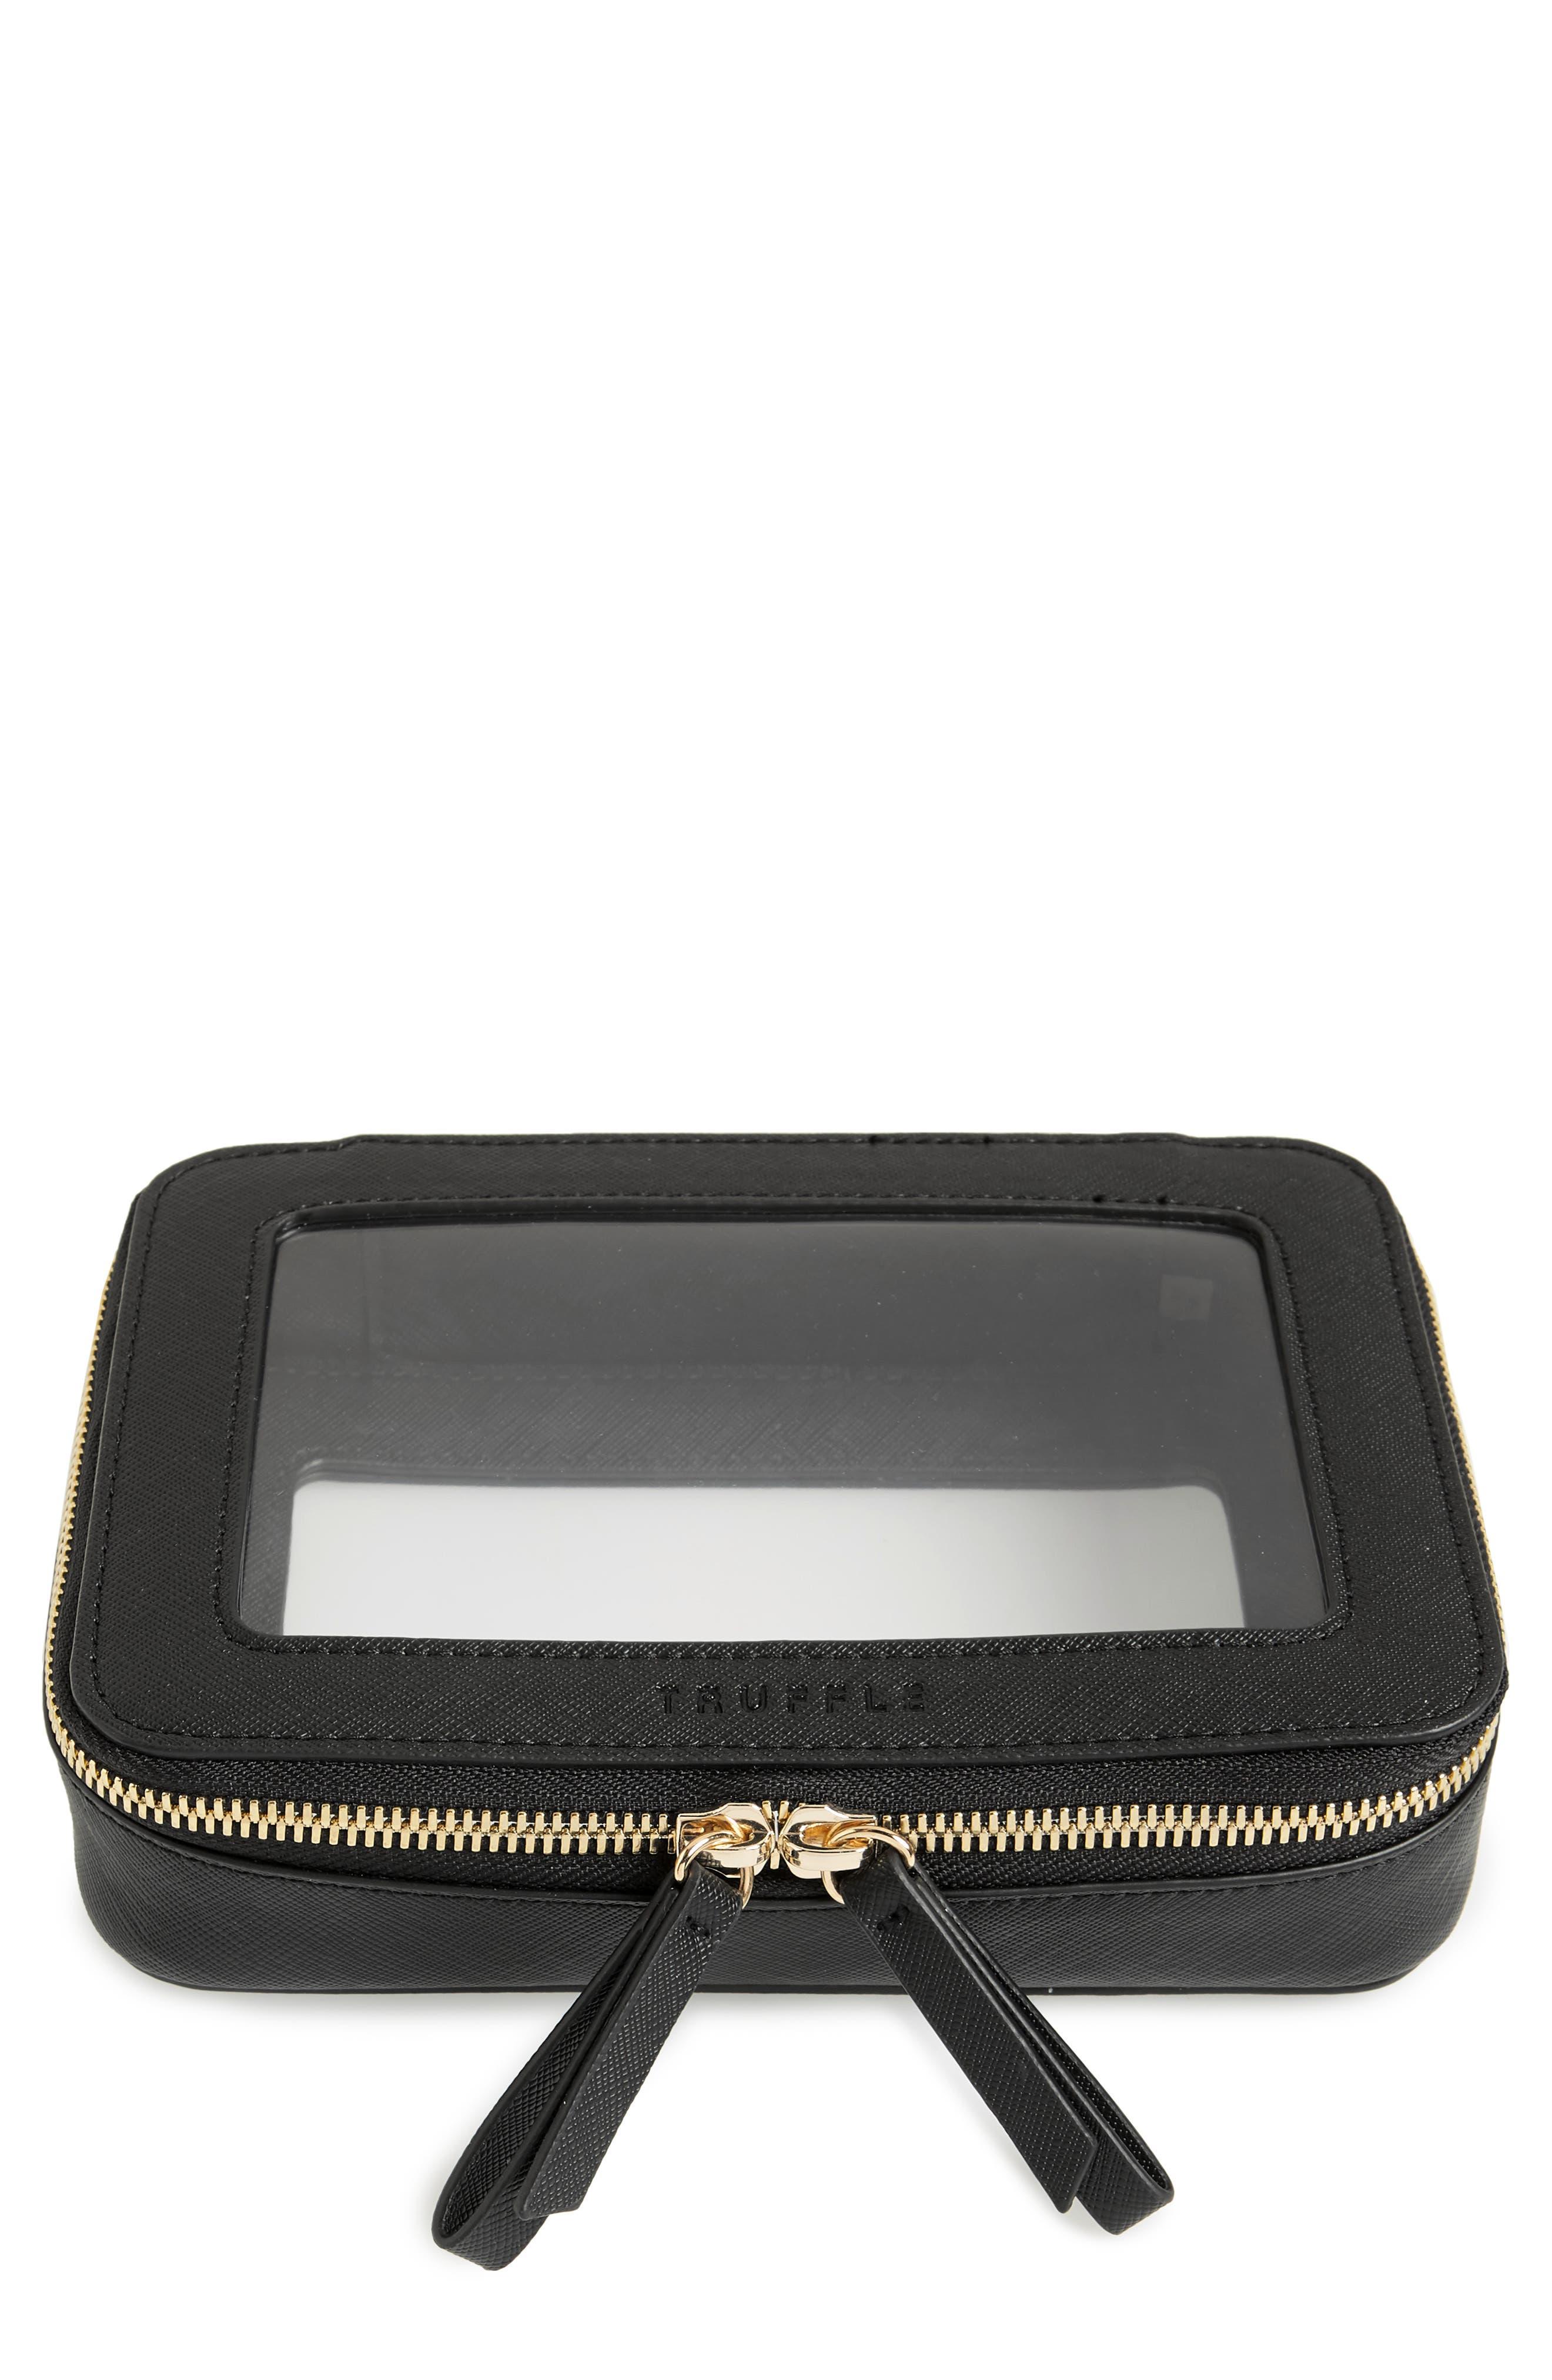 TRUFFLE Clarity Jetset Cosmetics Case, Main, color, BLACK